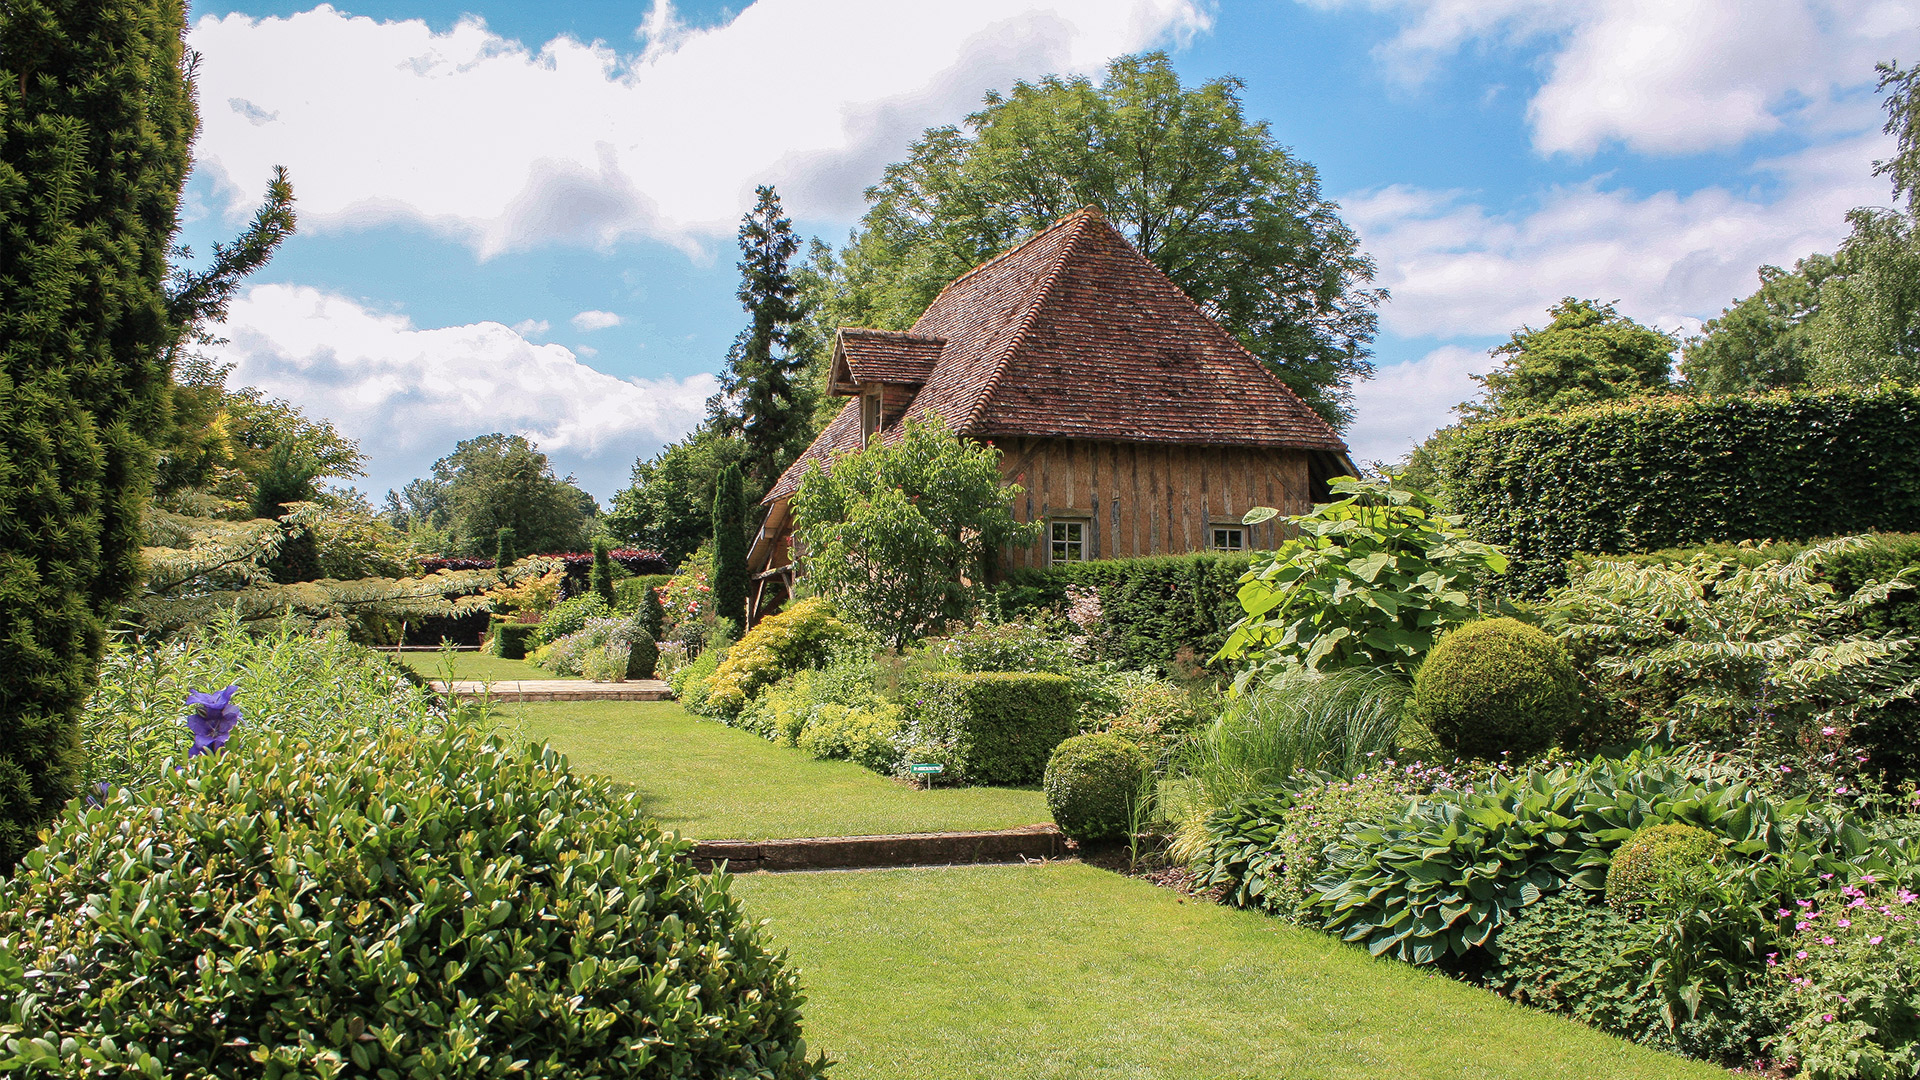 site officiel les jardins du pays d 39 auge cambremer. Black Bedroom Furniture Sets. Home Design Ideas